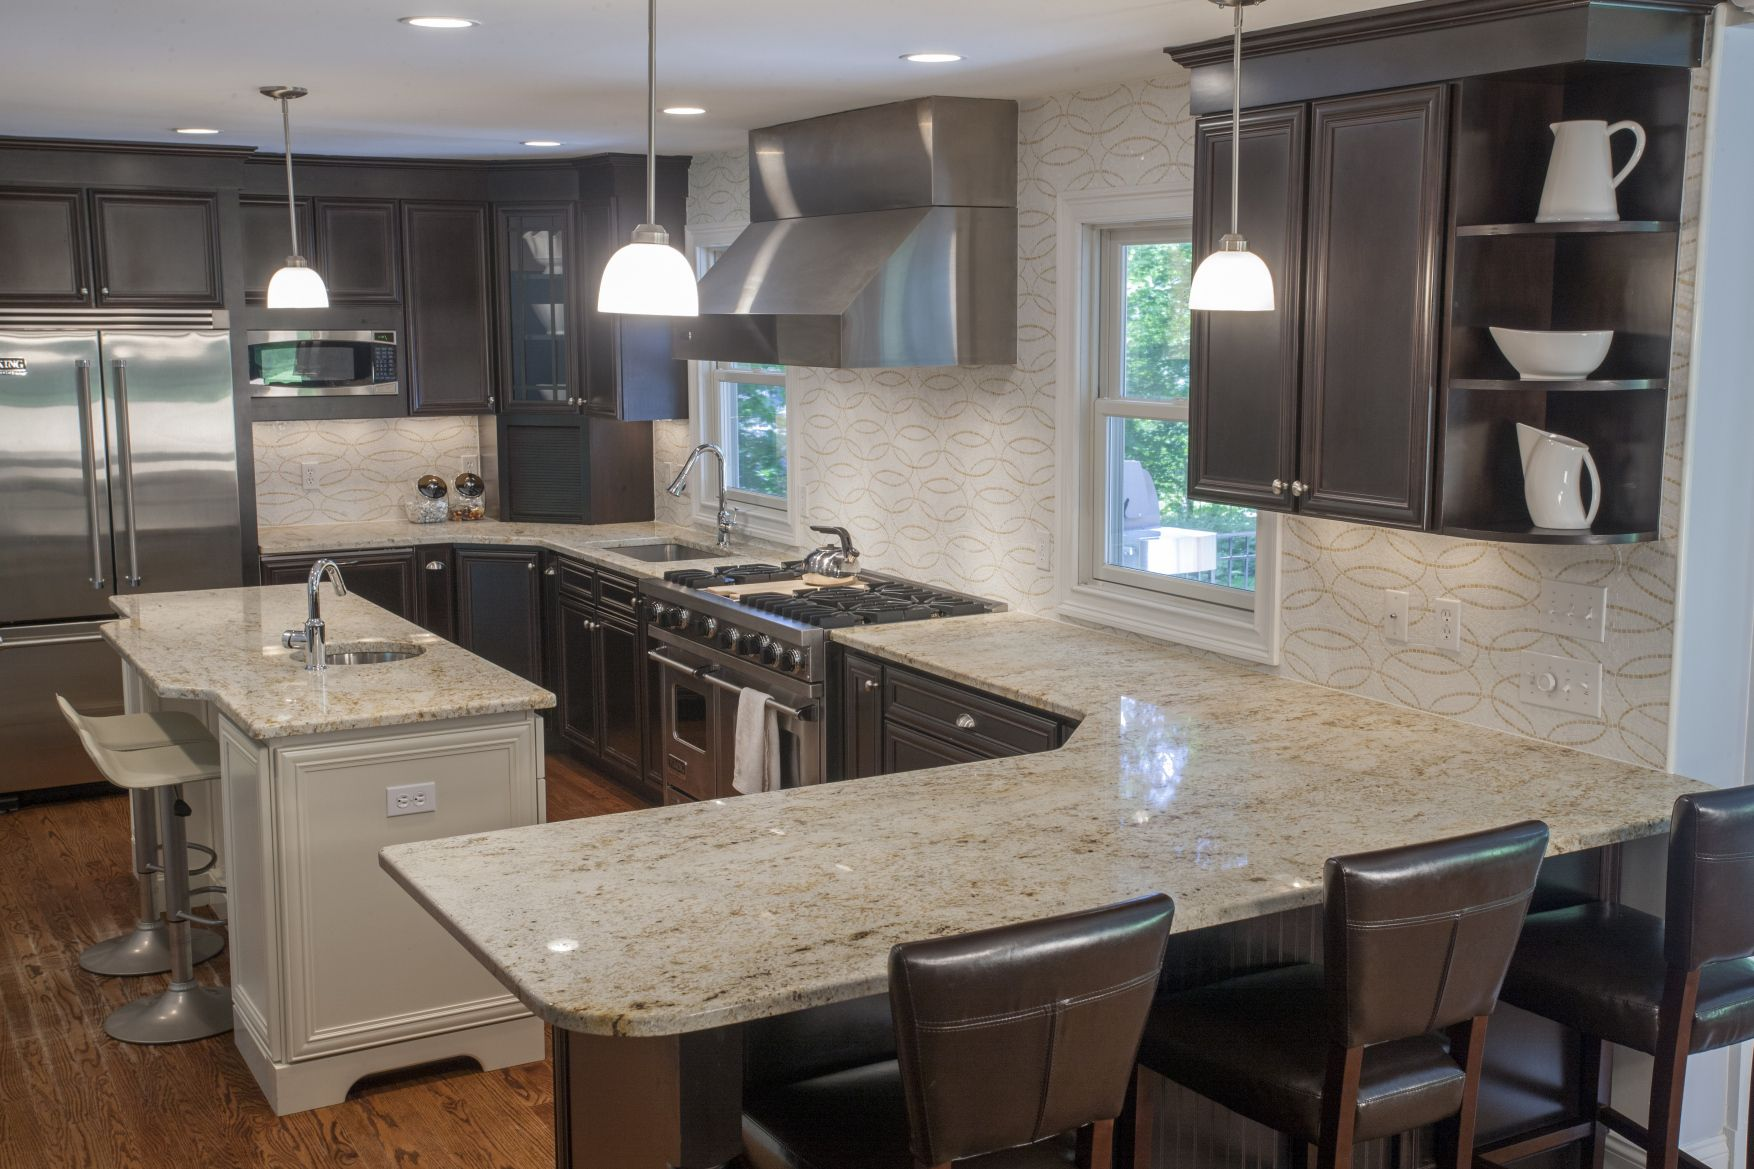 2019 Granite Countertop Pictures Kitchen Kitchen Design And